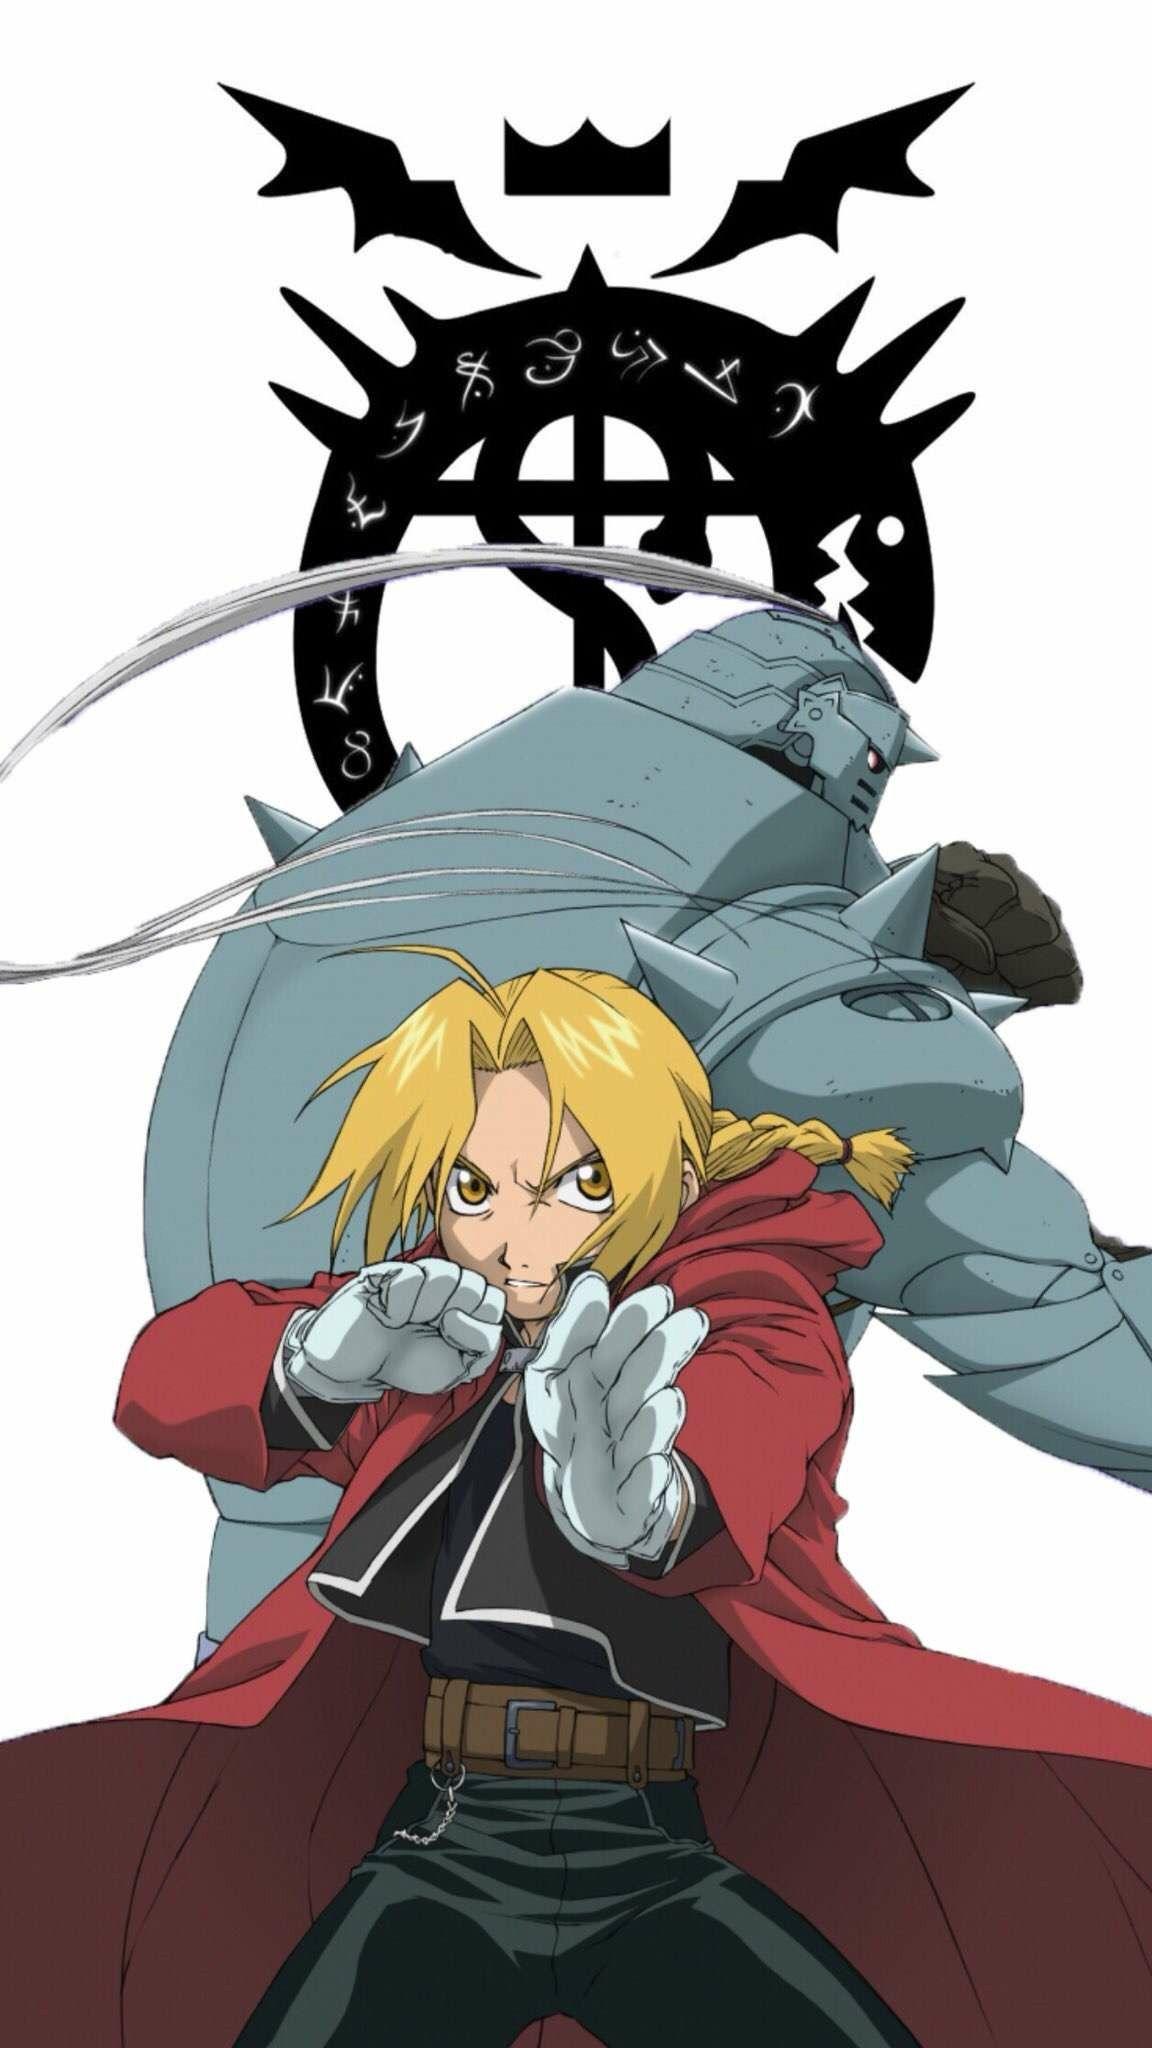 Pin by Emily Murdock on Fullmetal Alchemist Anime